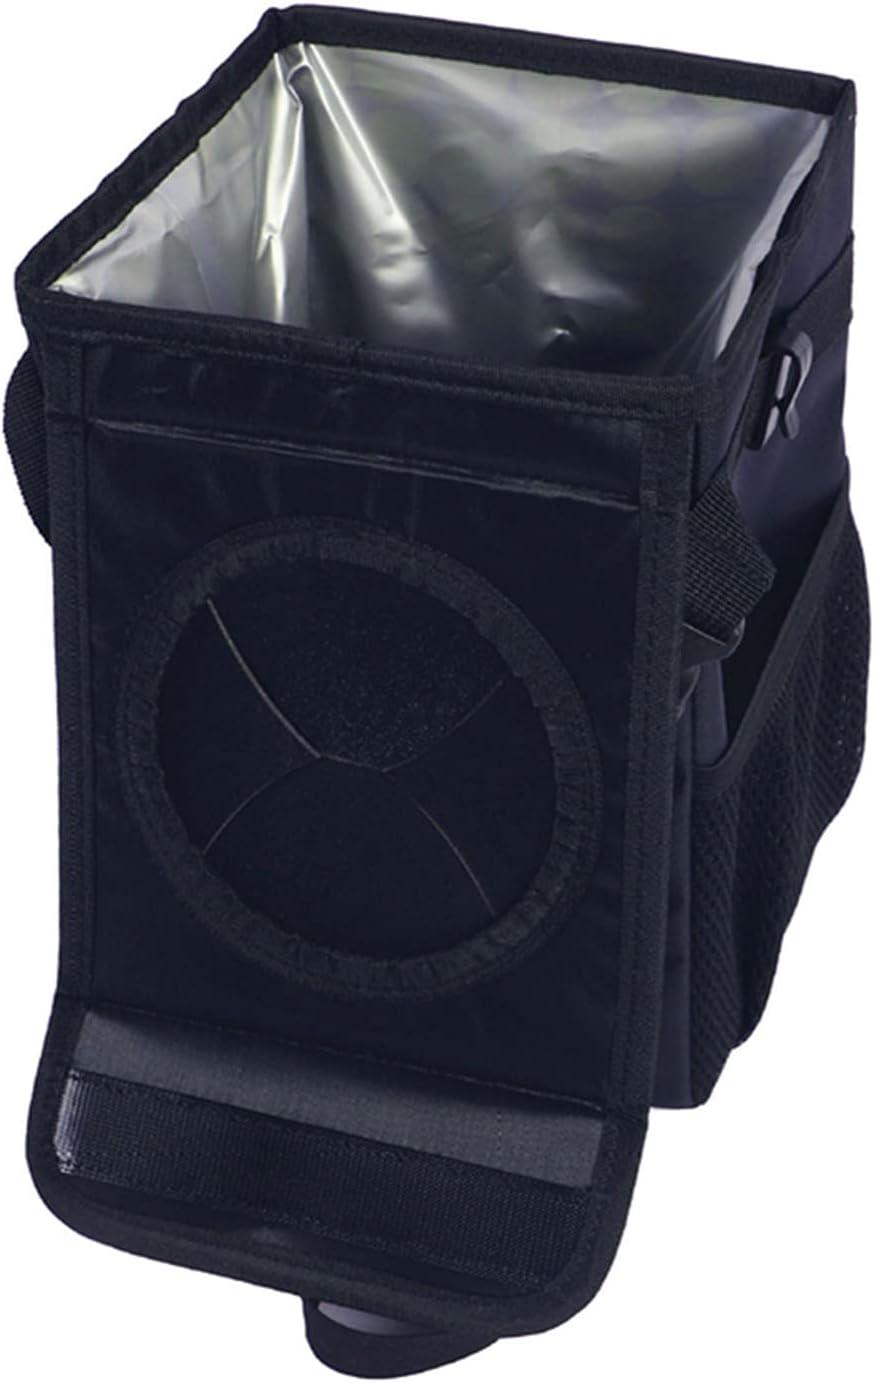 WERTYU Car Max 84% OFF Waterproof Folding Trash Garbage Bin Creative Can safety